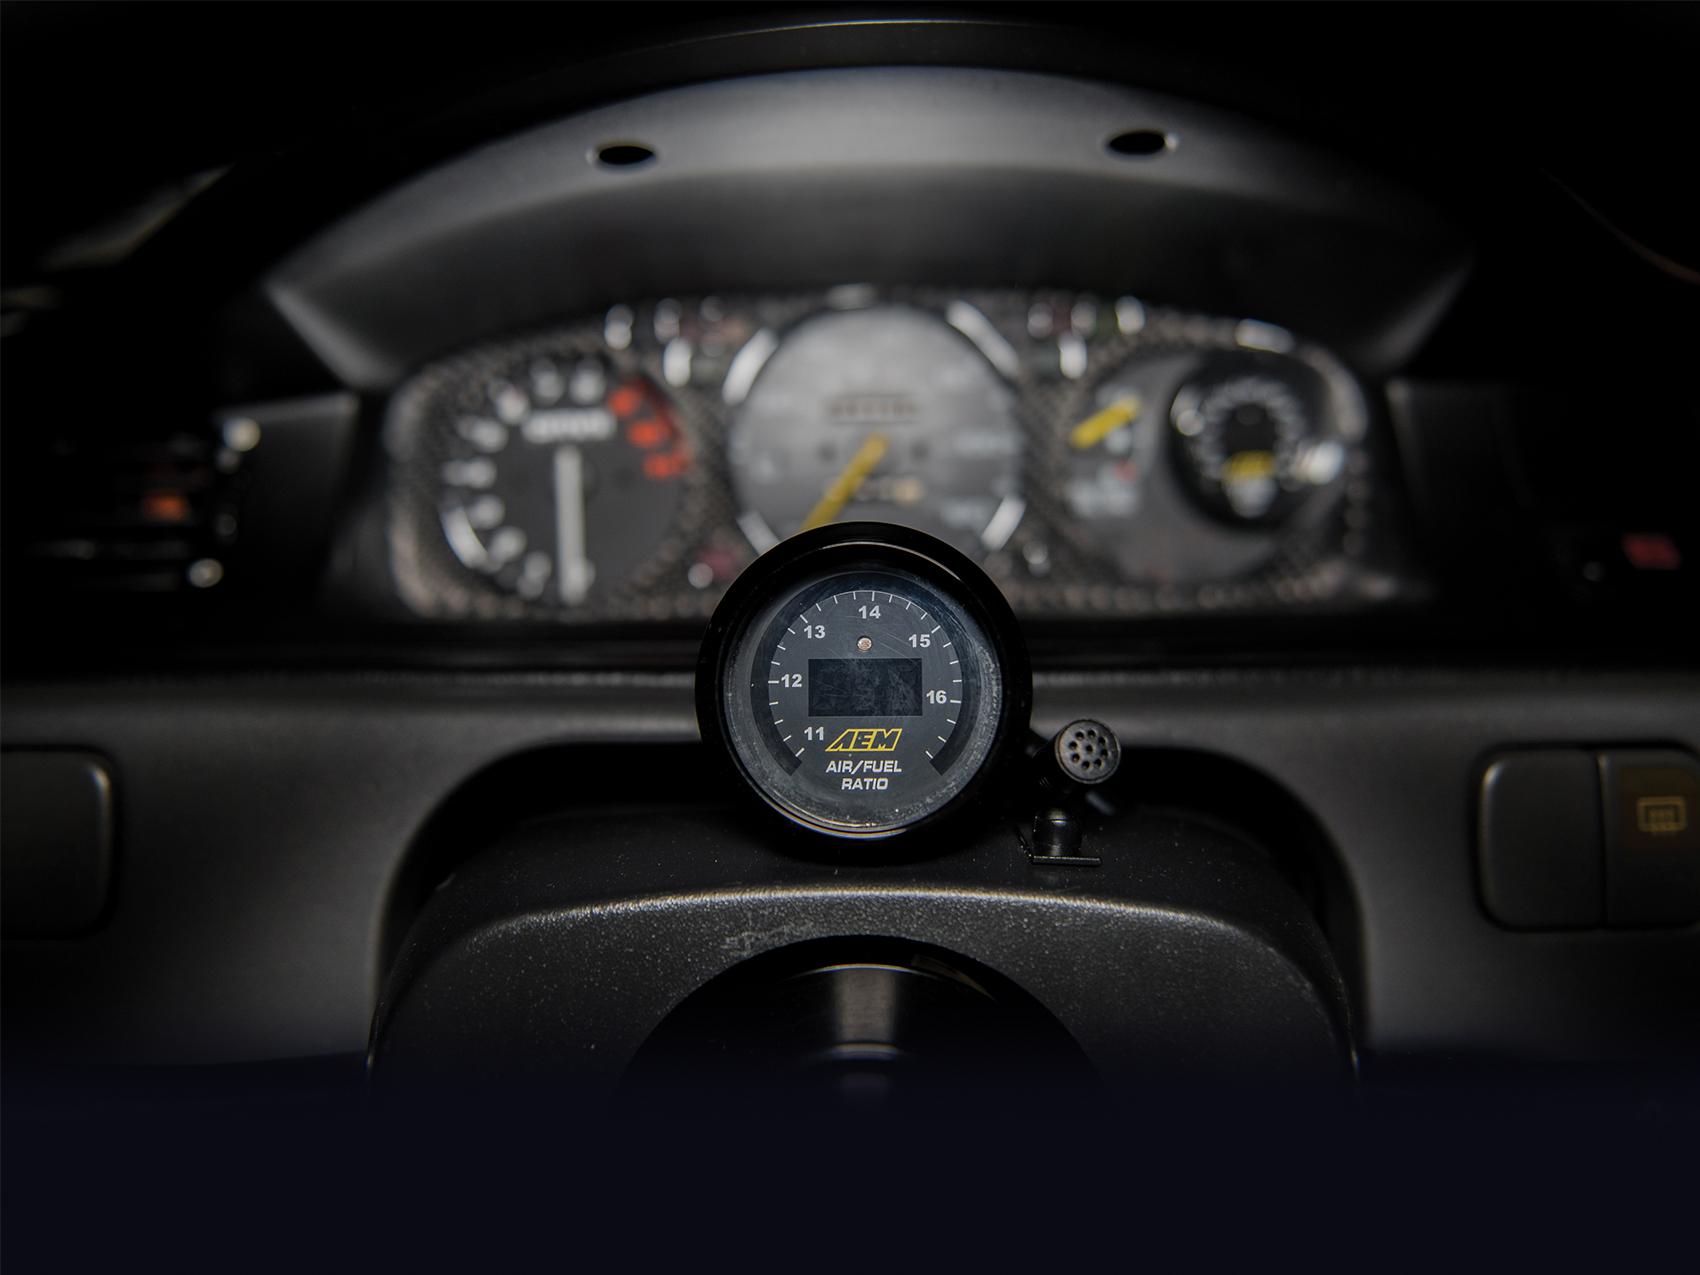 555 WHP Supercharged Honda Civic EG - Page 2 of 2 - DSPORT Magazine